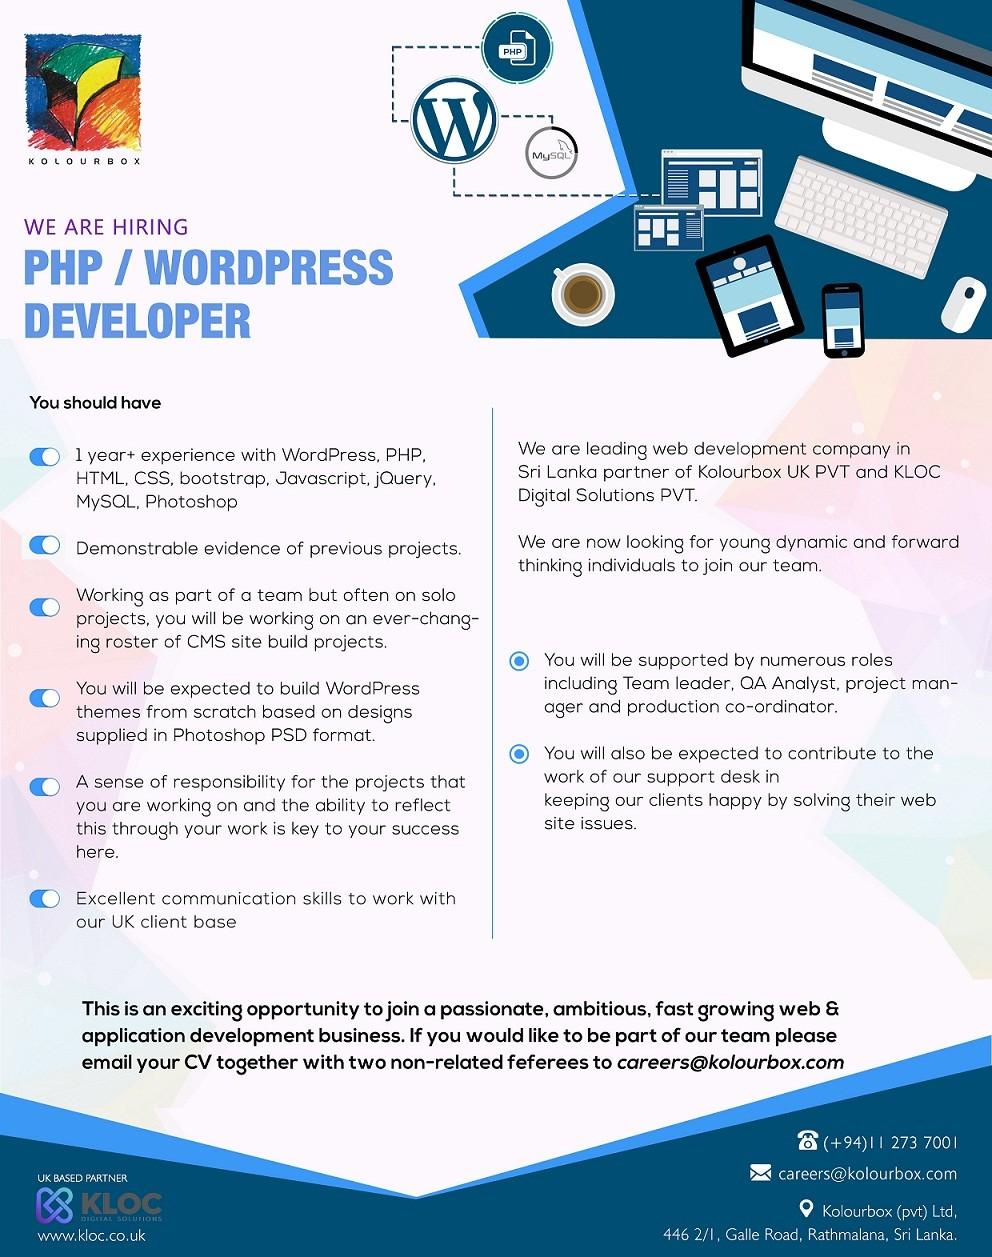 PHP / Wordpress Developer